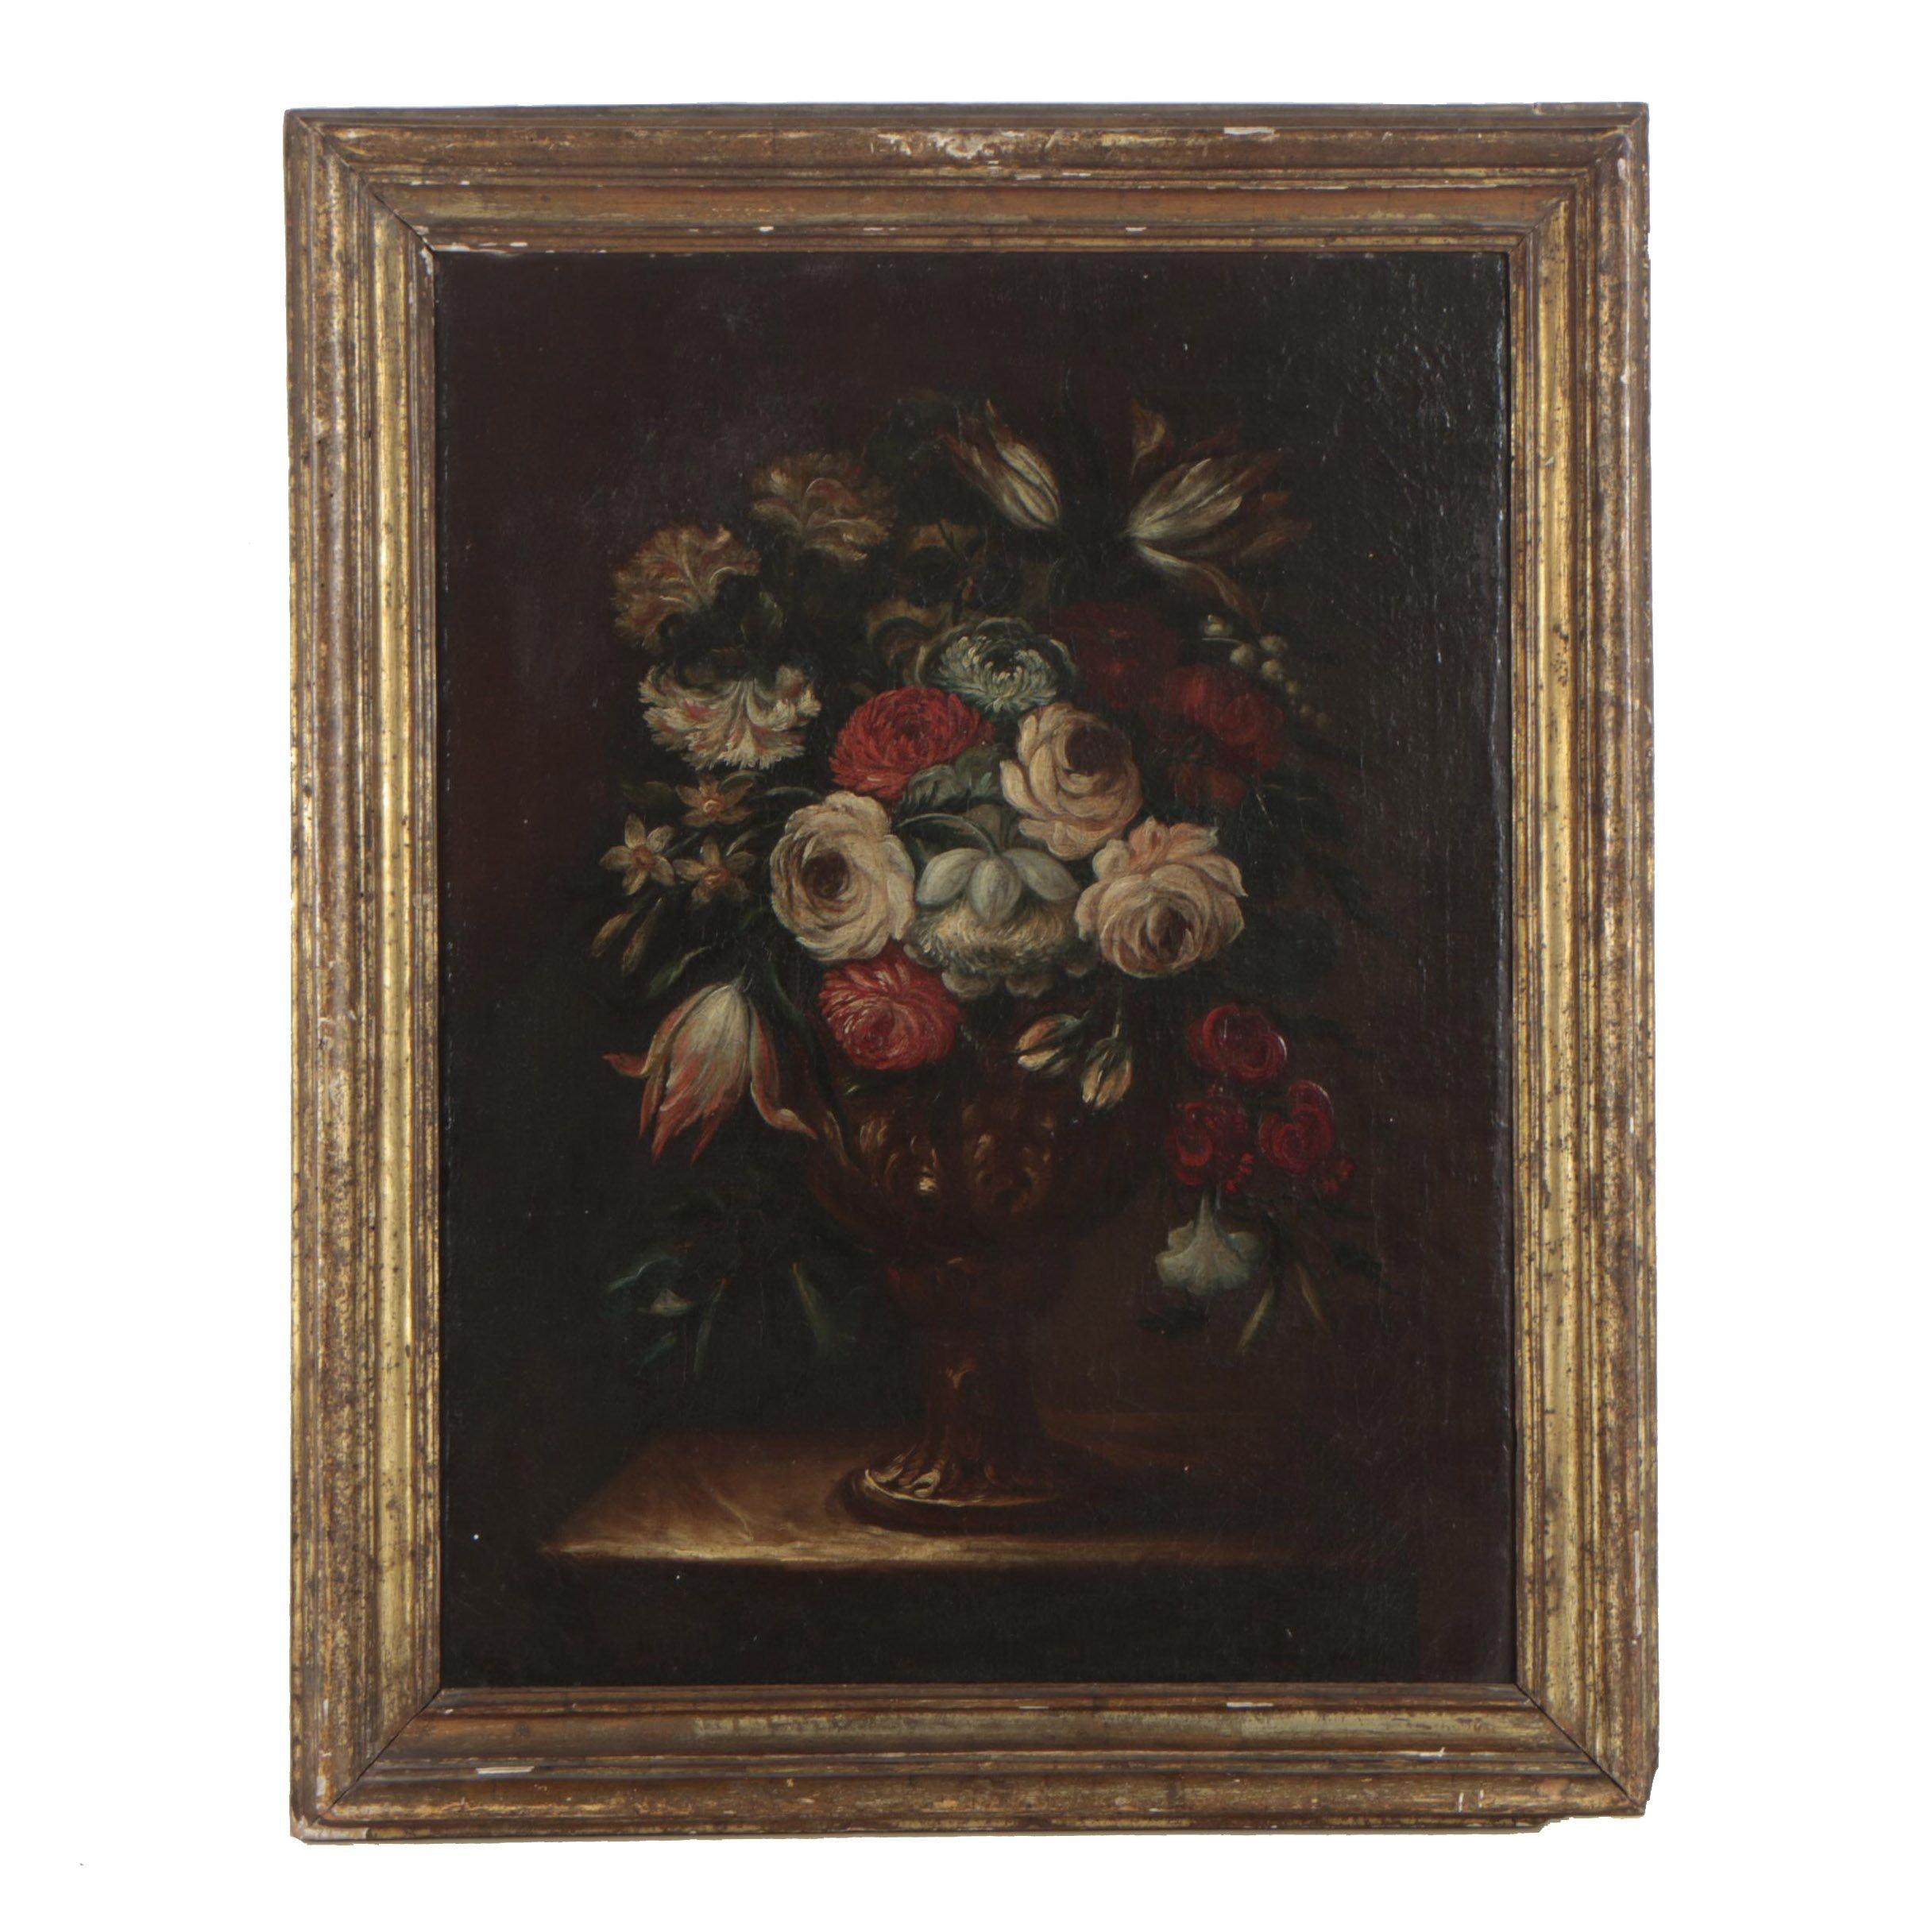 19th Century Still Life Oil Painting